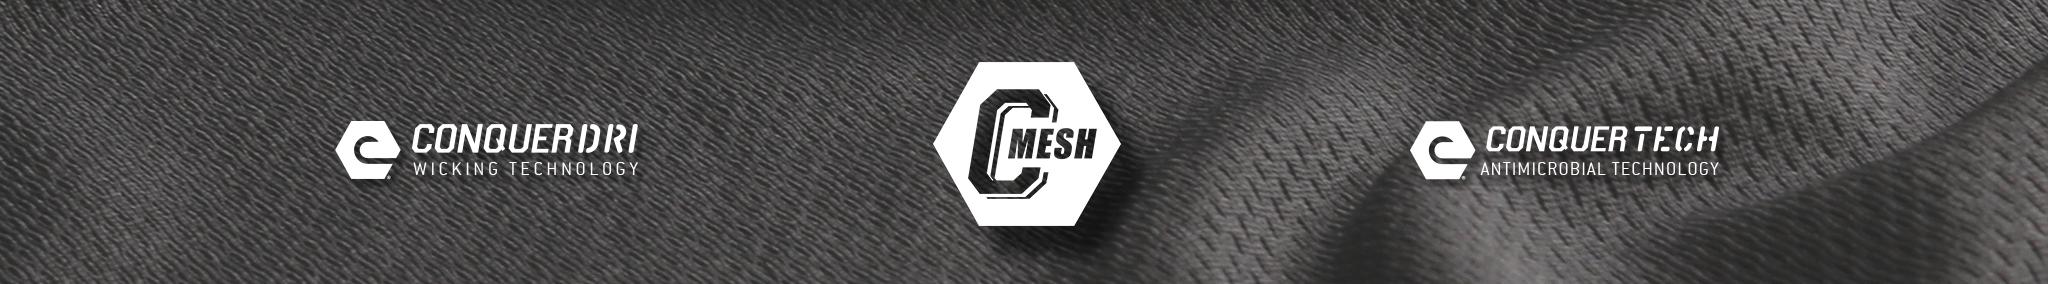 Conquer Mesh